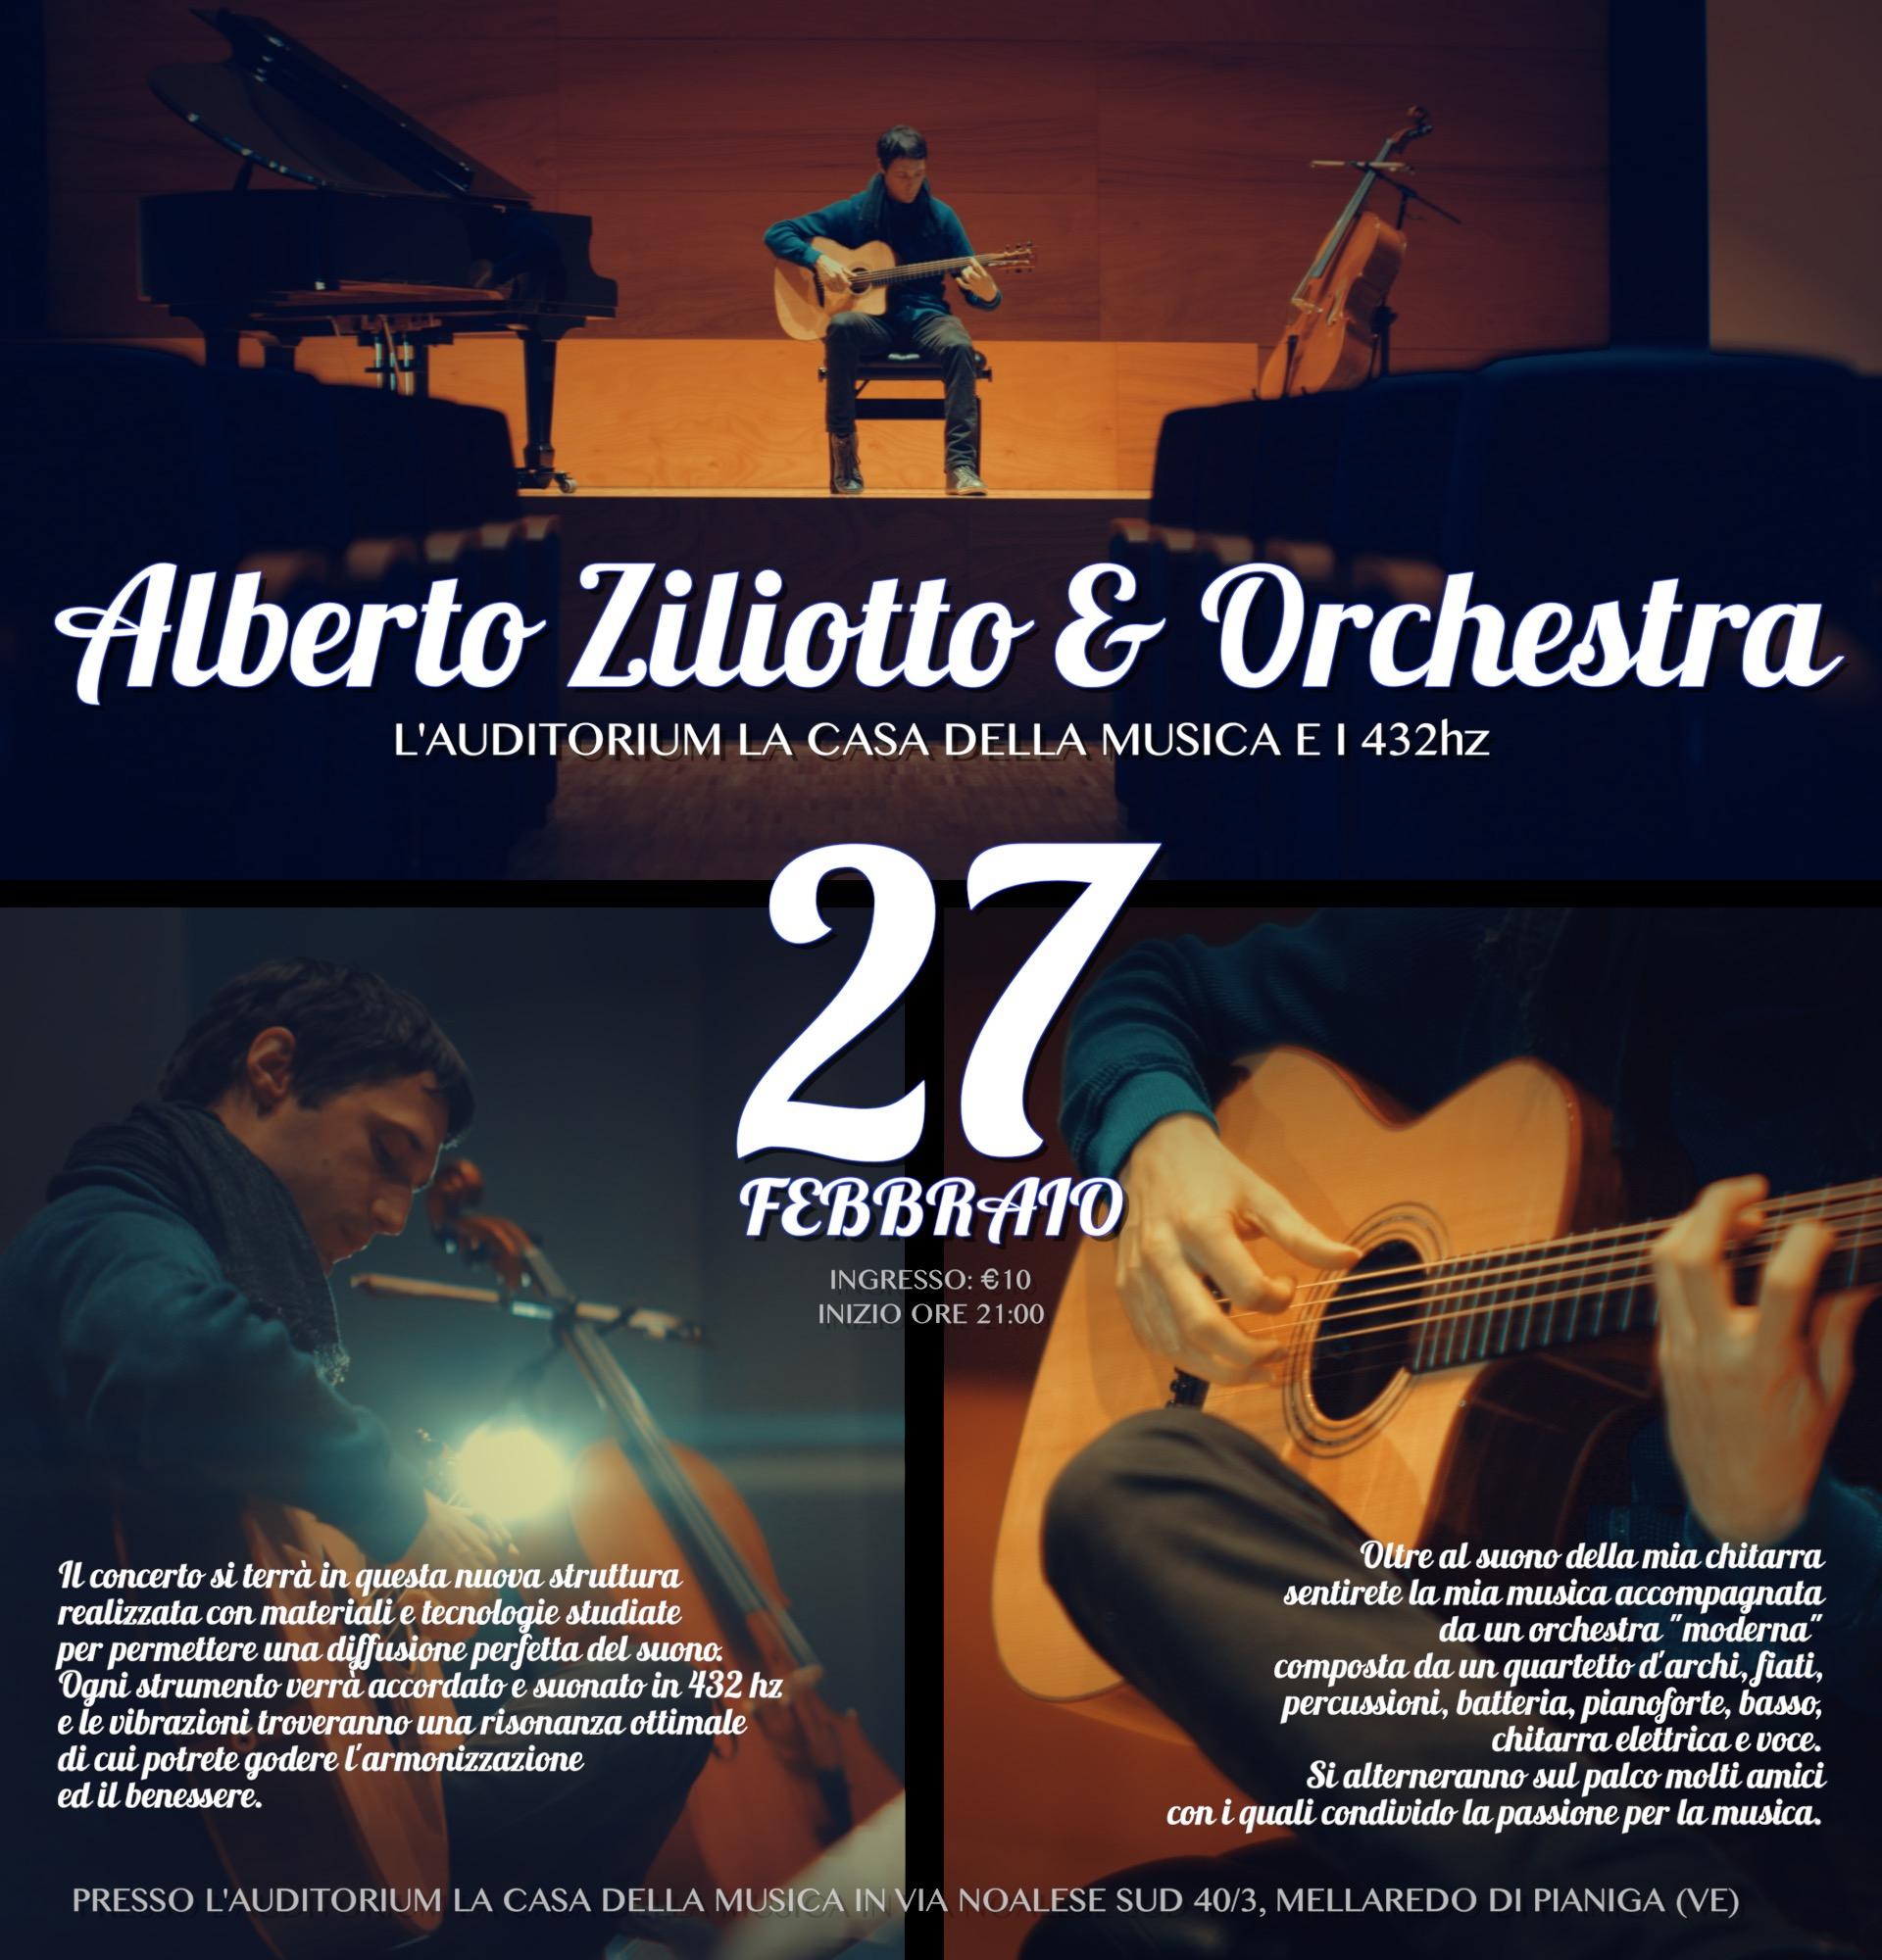 Alberto Ziliotto & Orchestra (i entry)